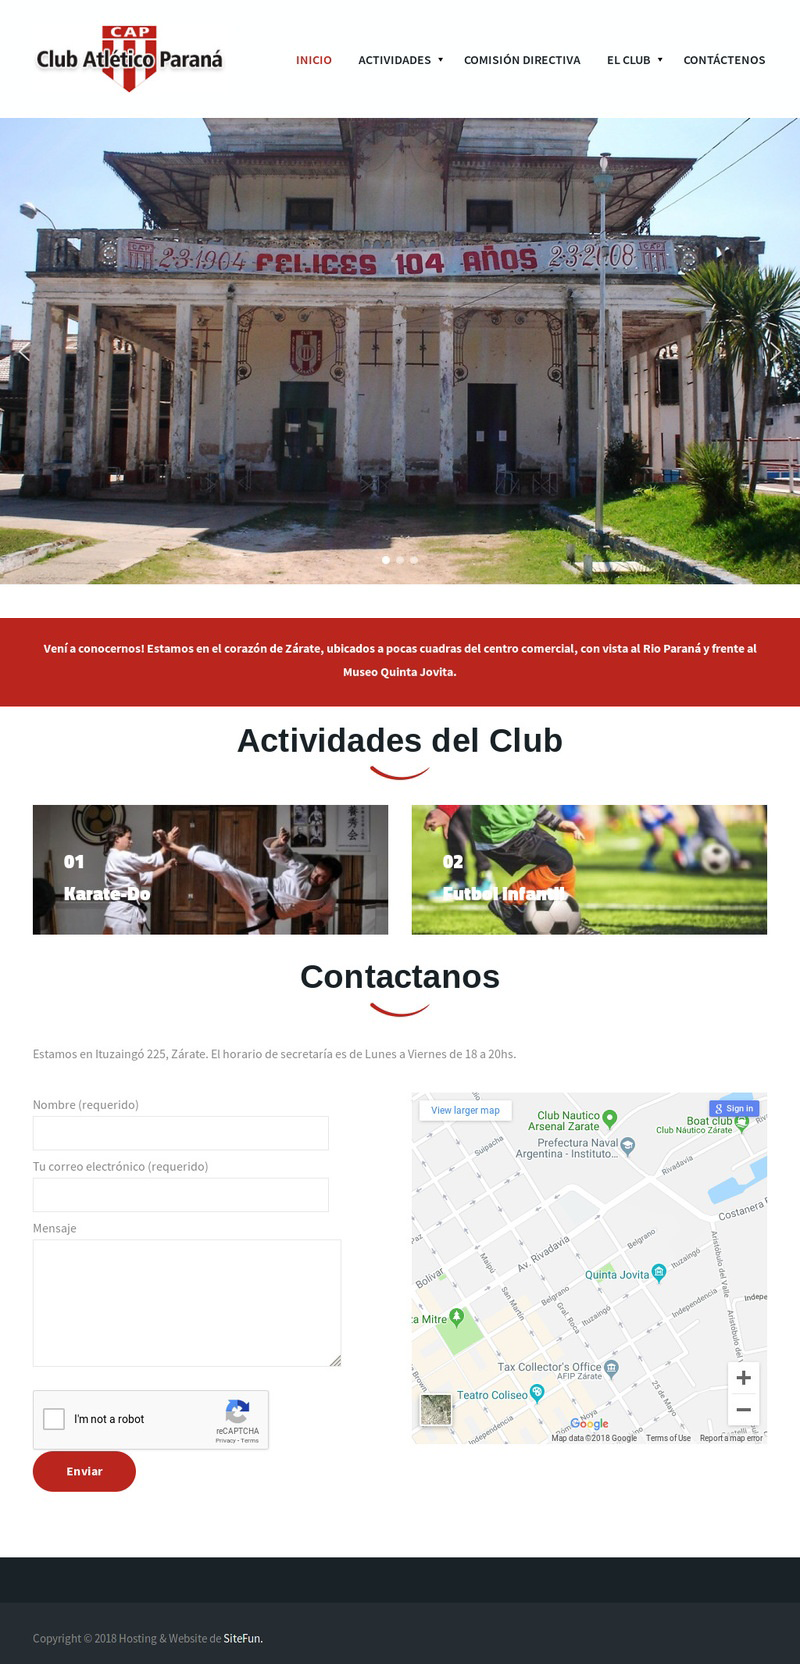 Club Atlético Paraná